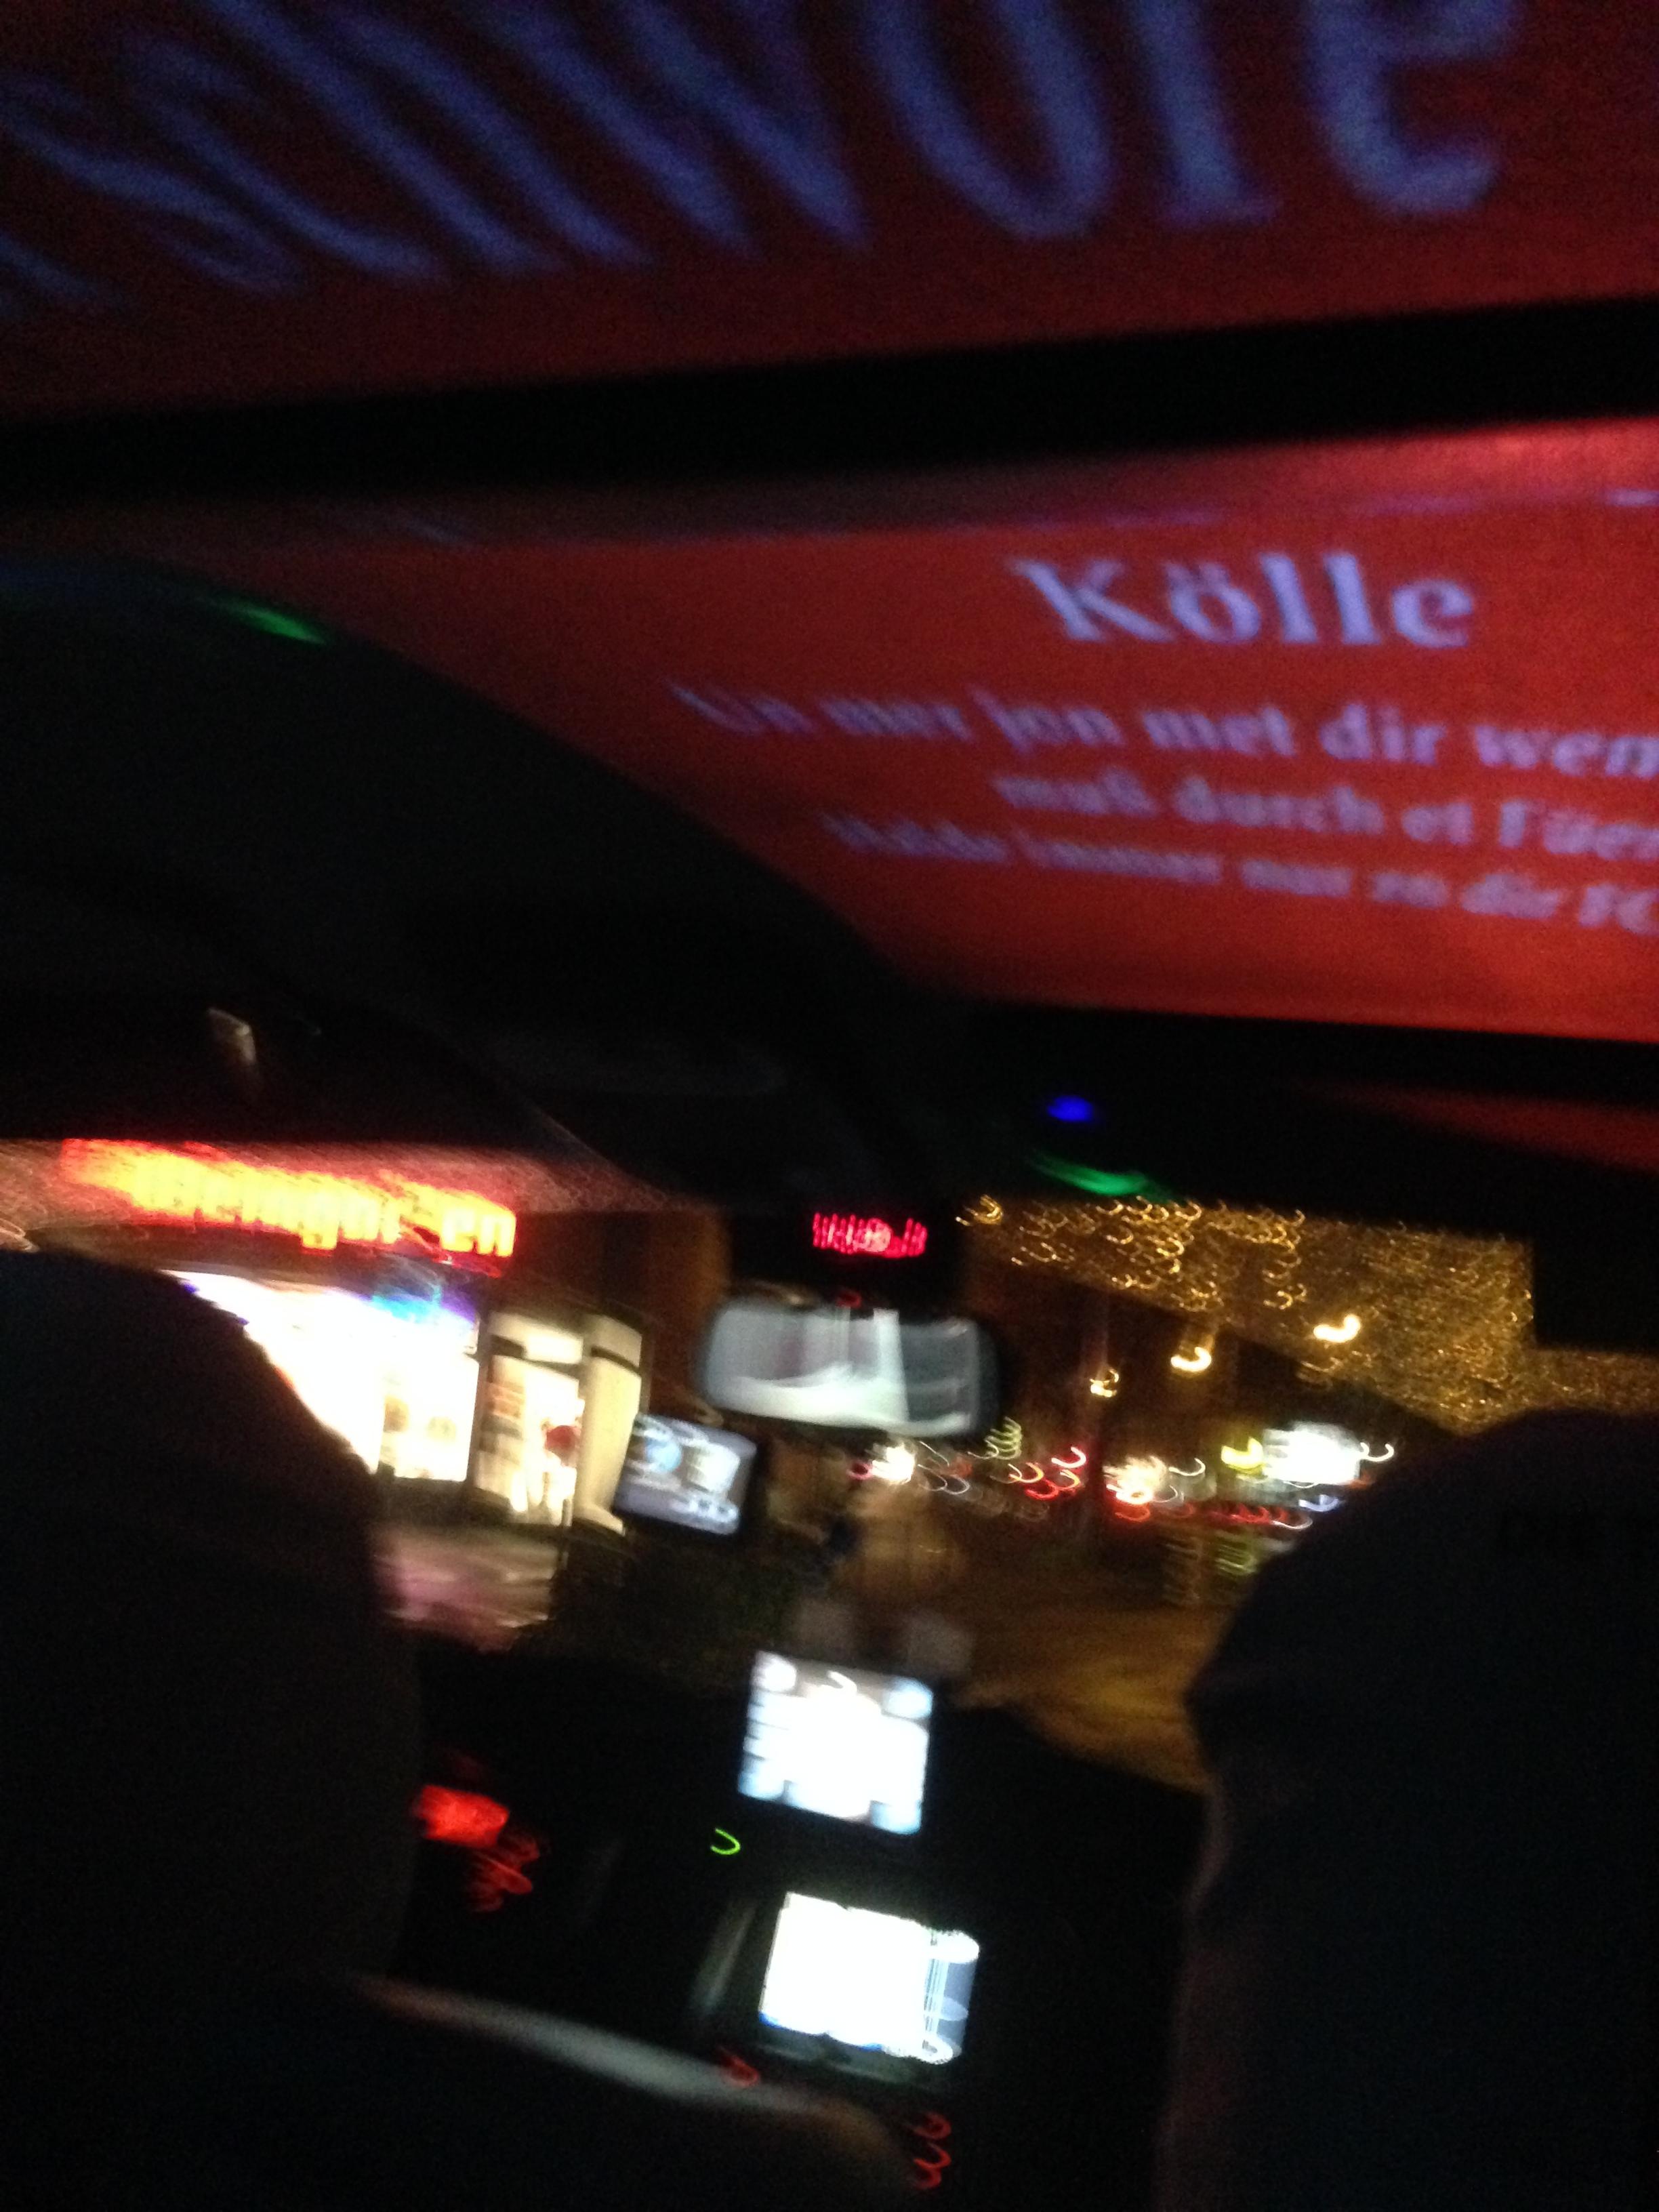 koln taxi photo.JPG